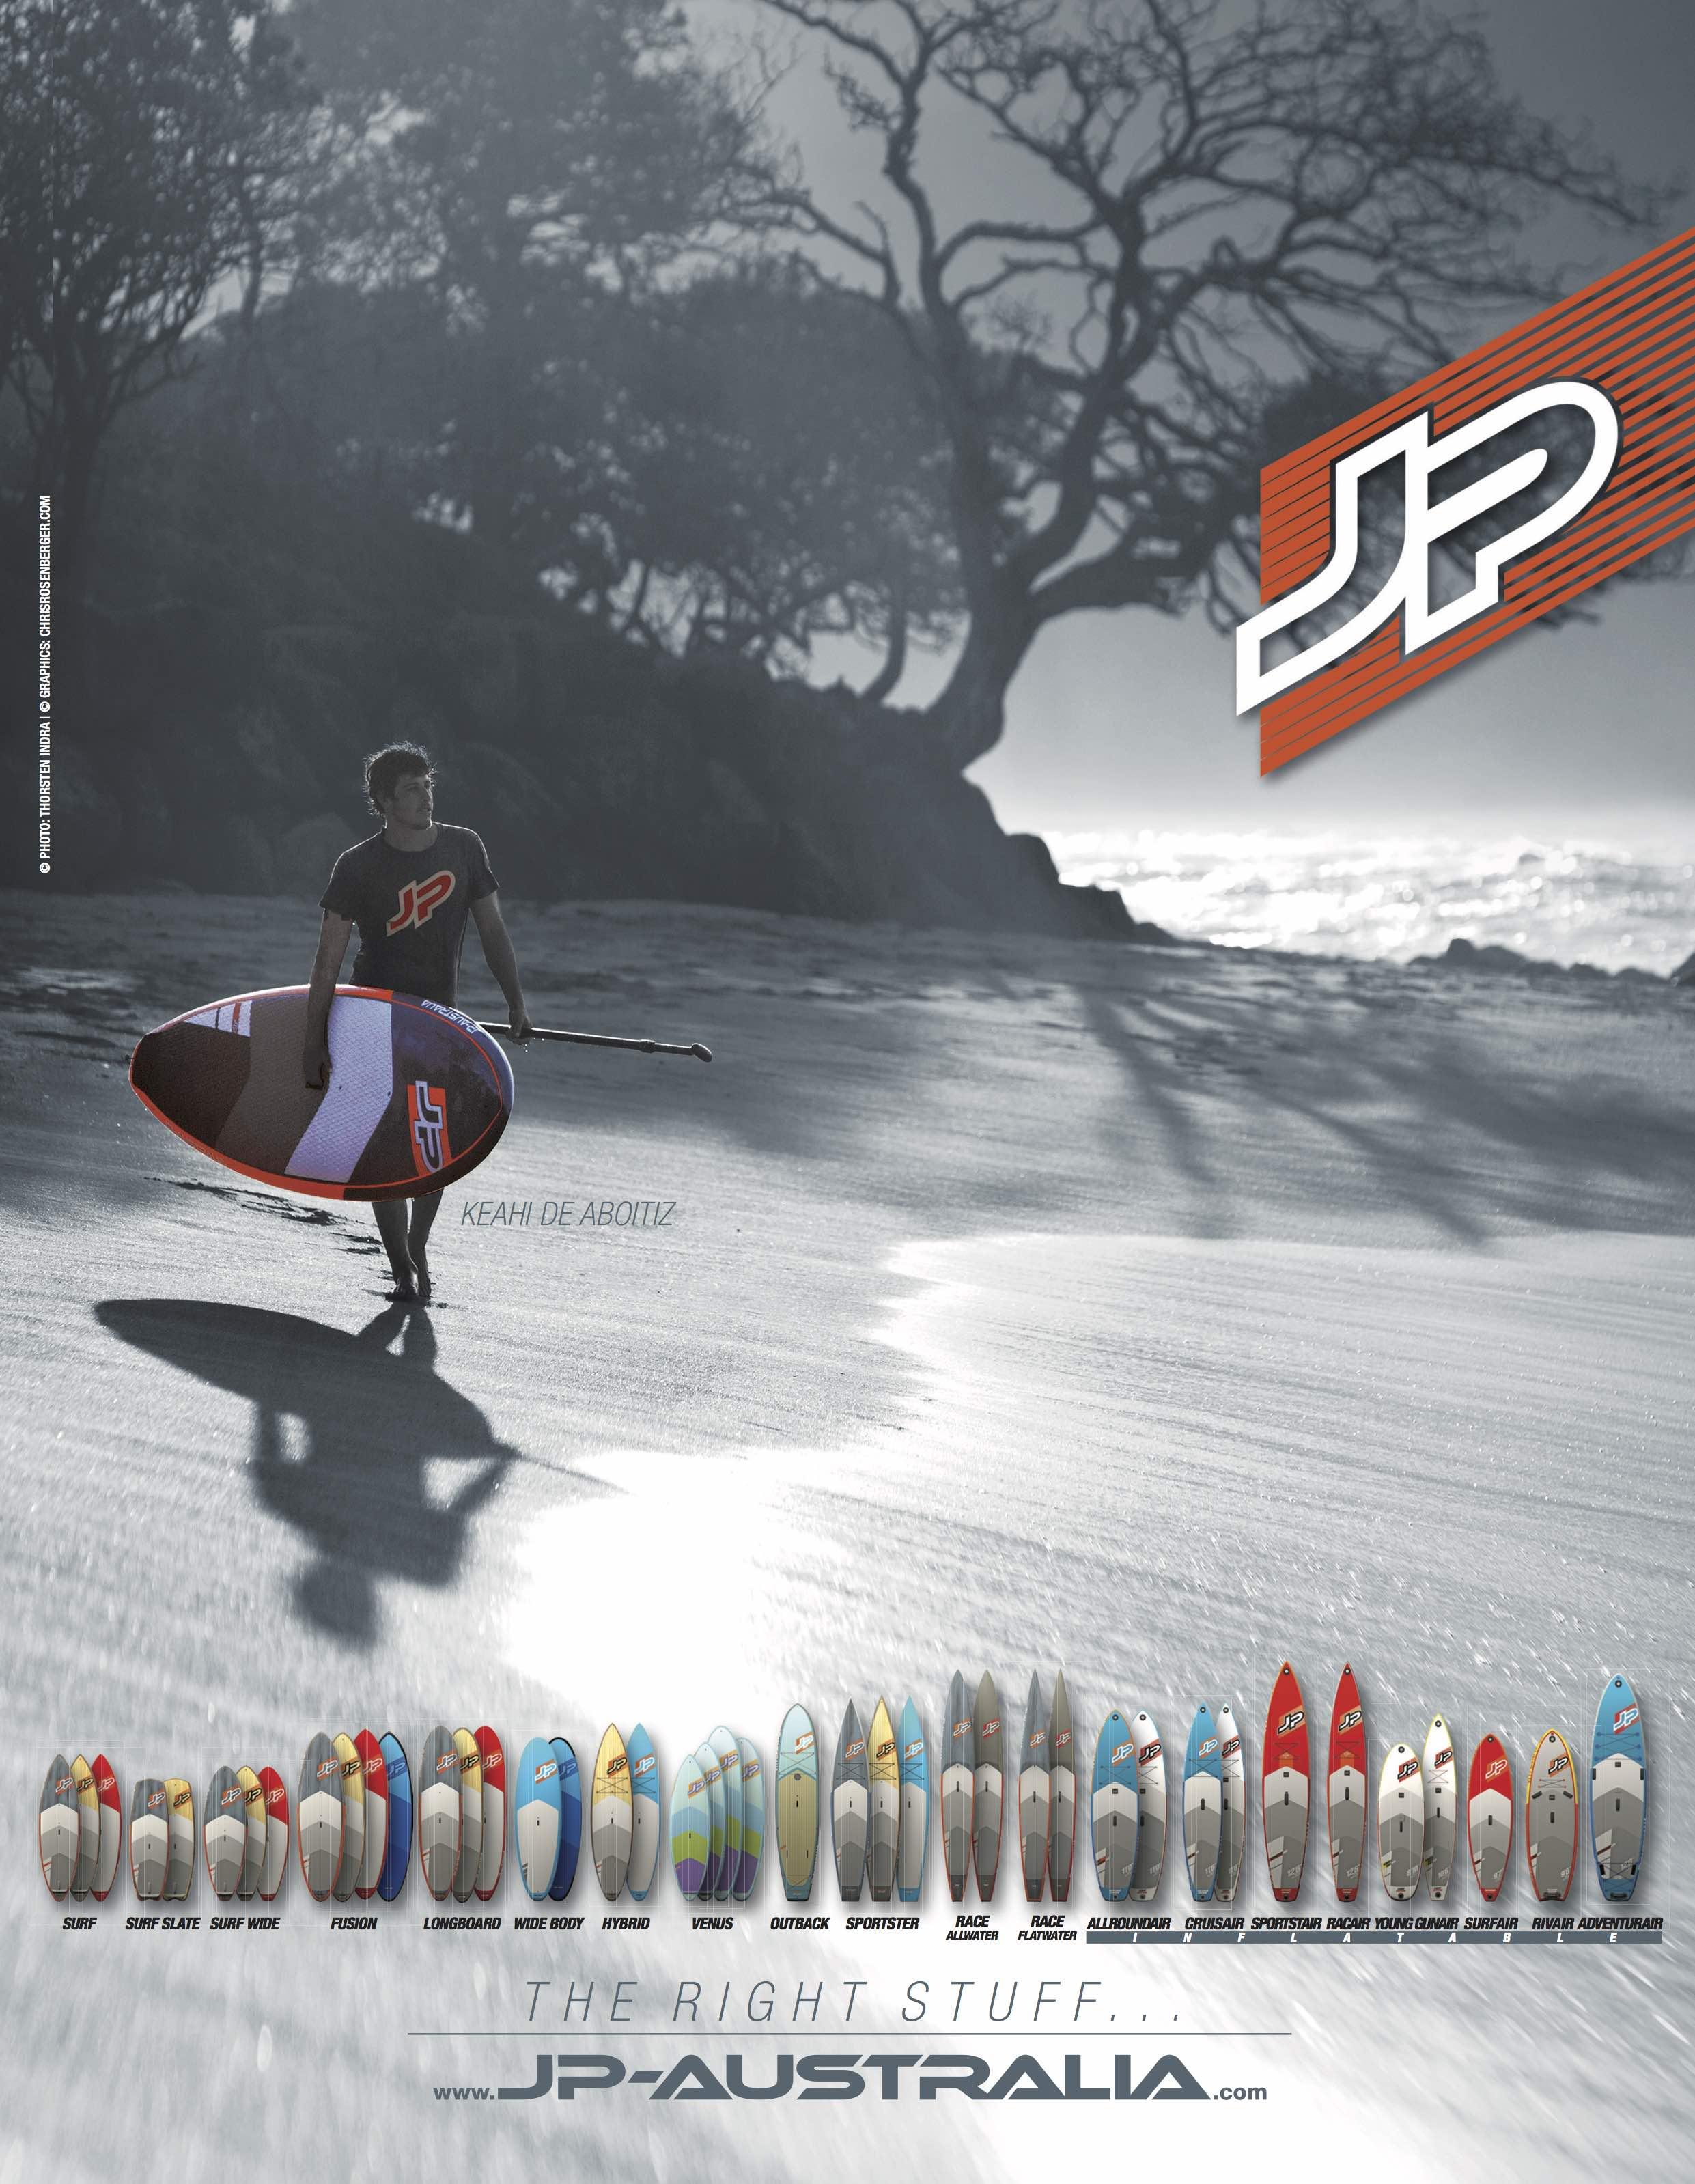 86 JP Australia SURF